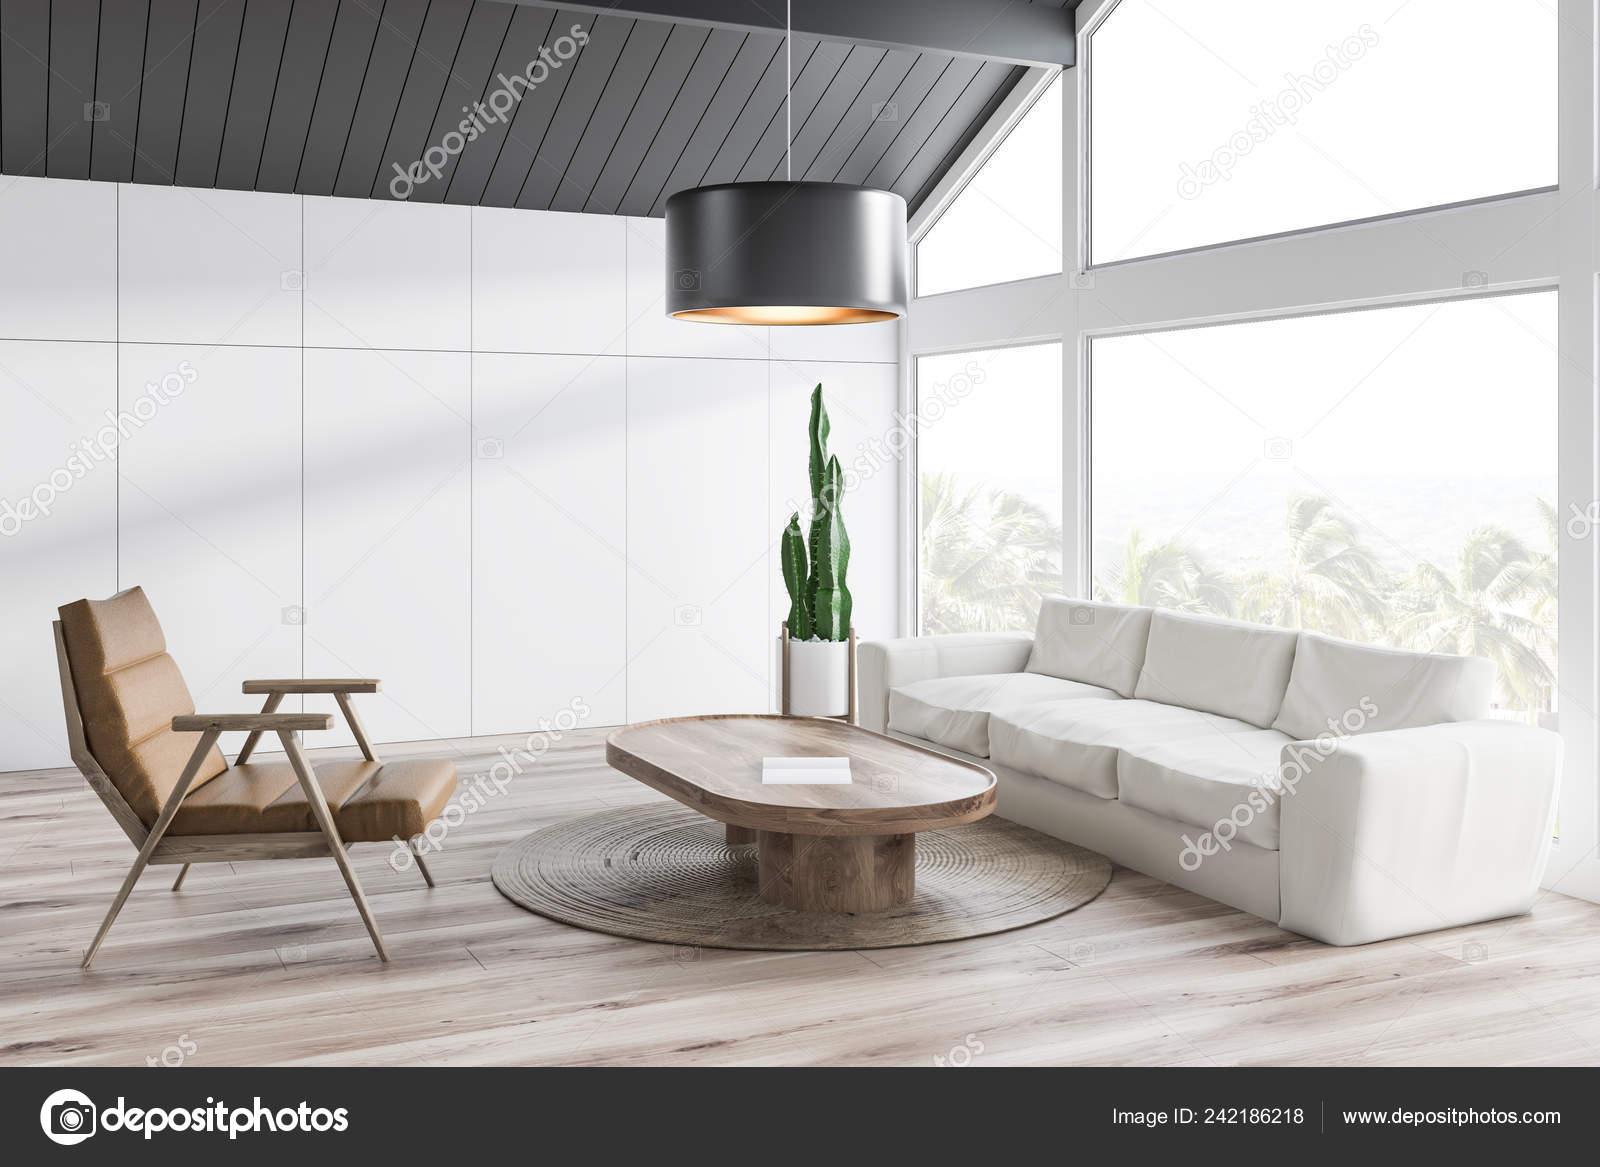 Corner Attic Living Room White Walls Gray Ceiling Wooden Floor Stock Photo C Denisismagilov 242186218